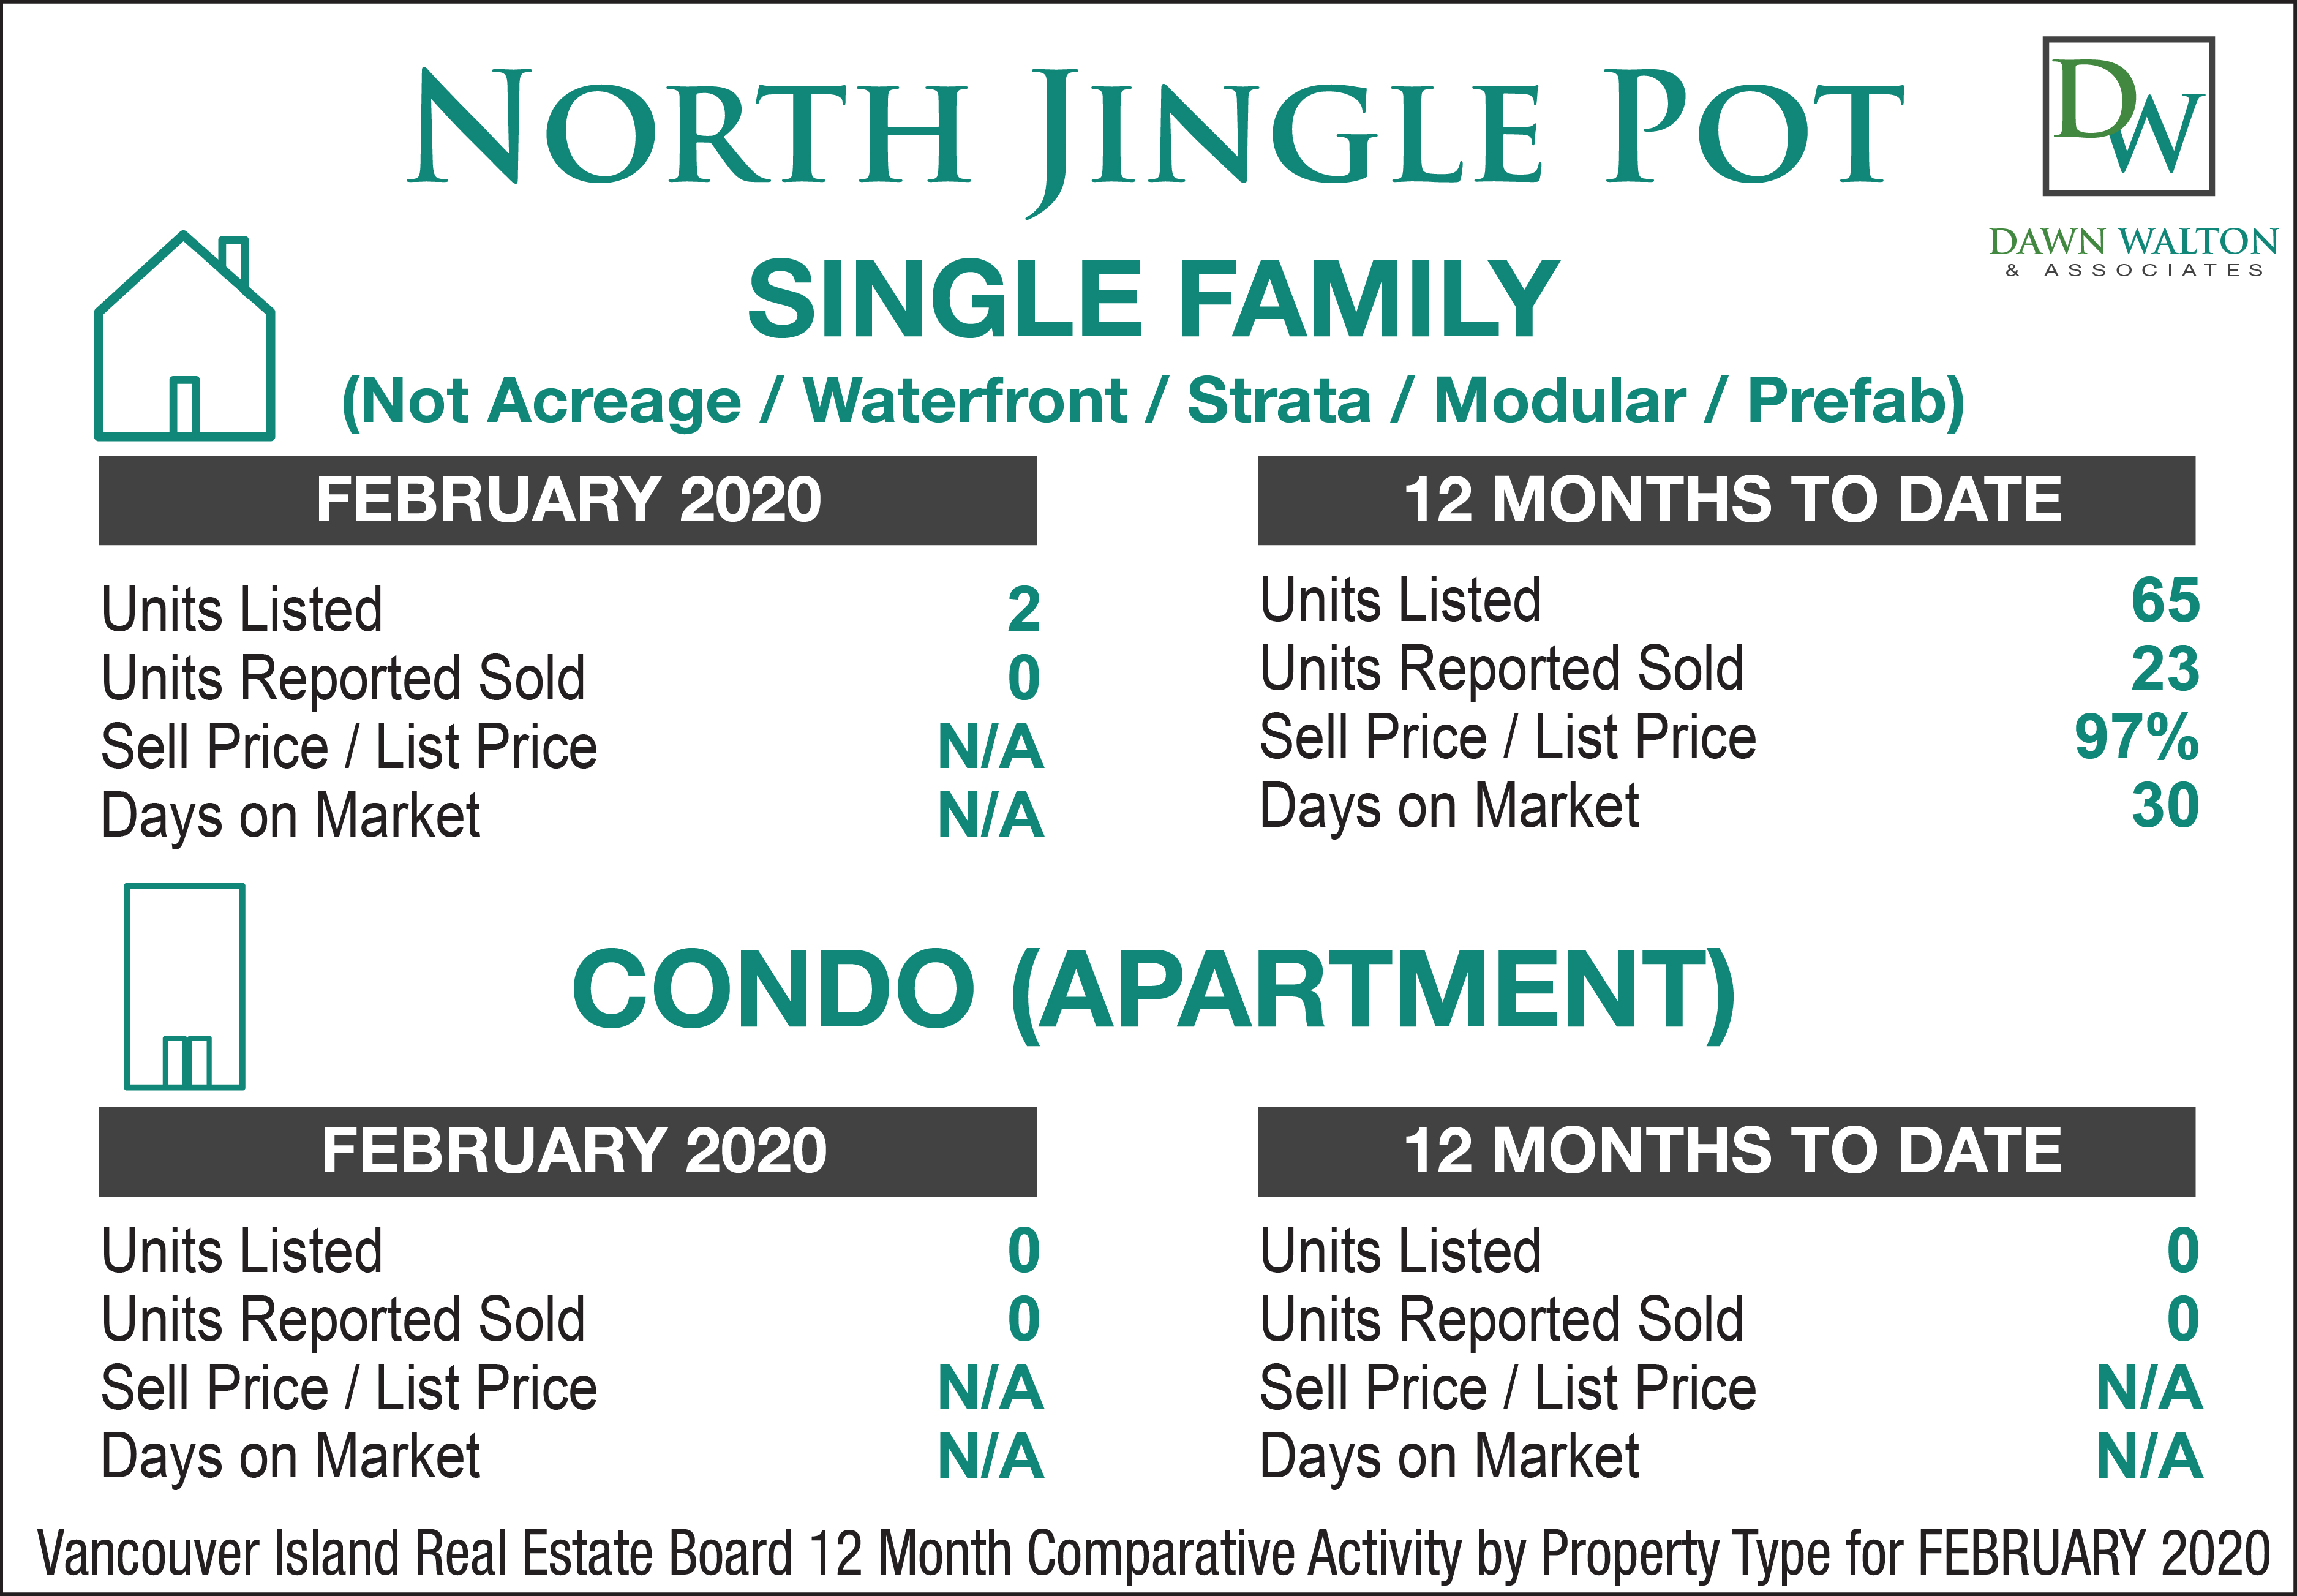 North Jingle Pot Real Estate Market Stats February 2020 - Nanaimo Realtor Dawn Walton